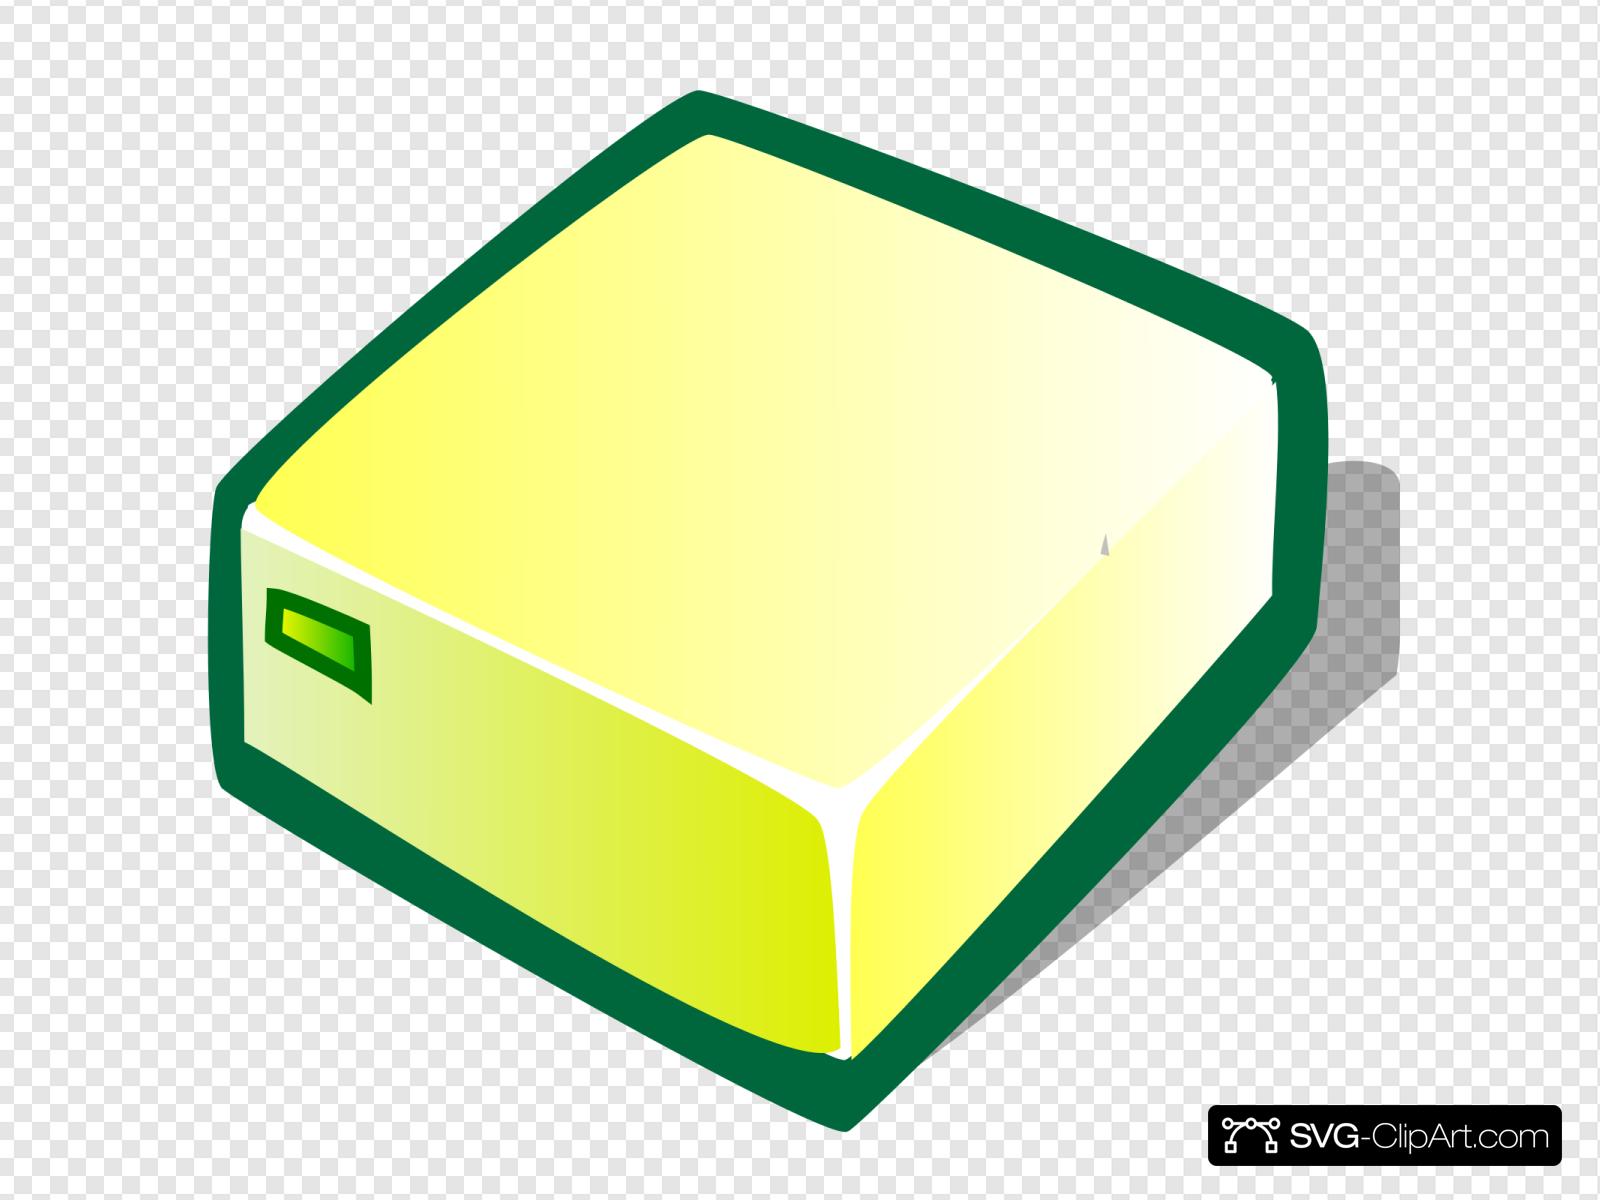 Yellow Box Clip art, Icon and SVG.